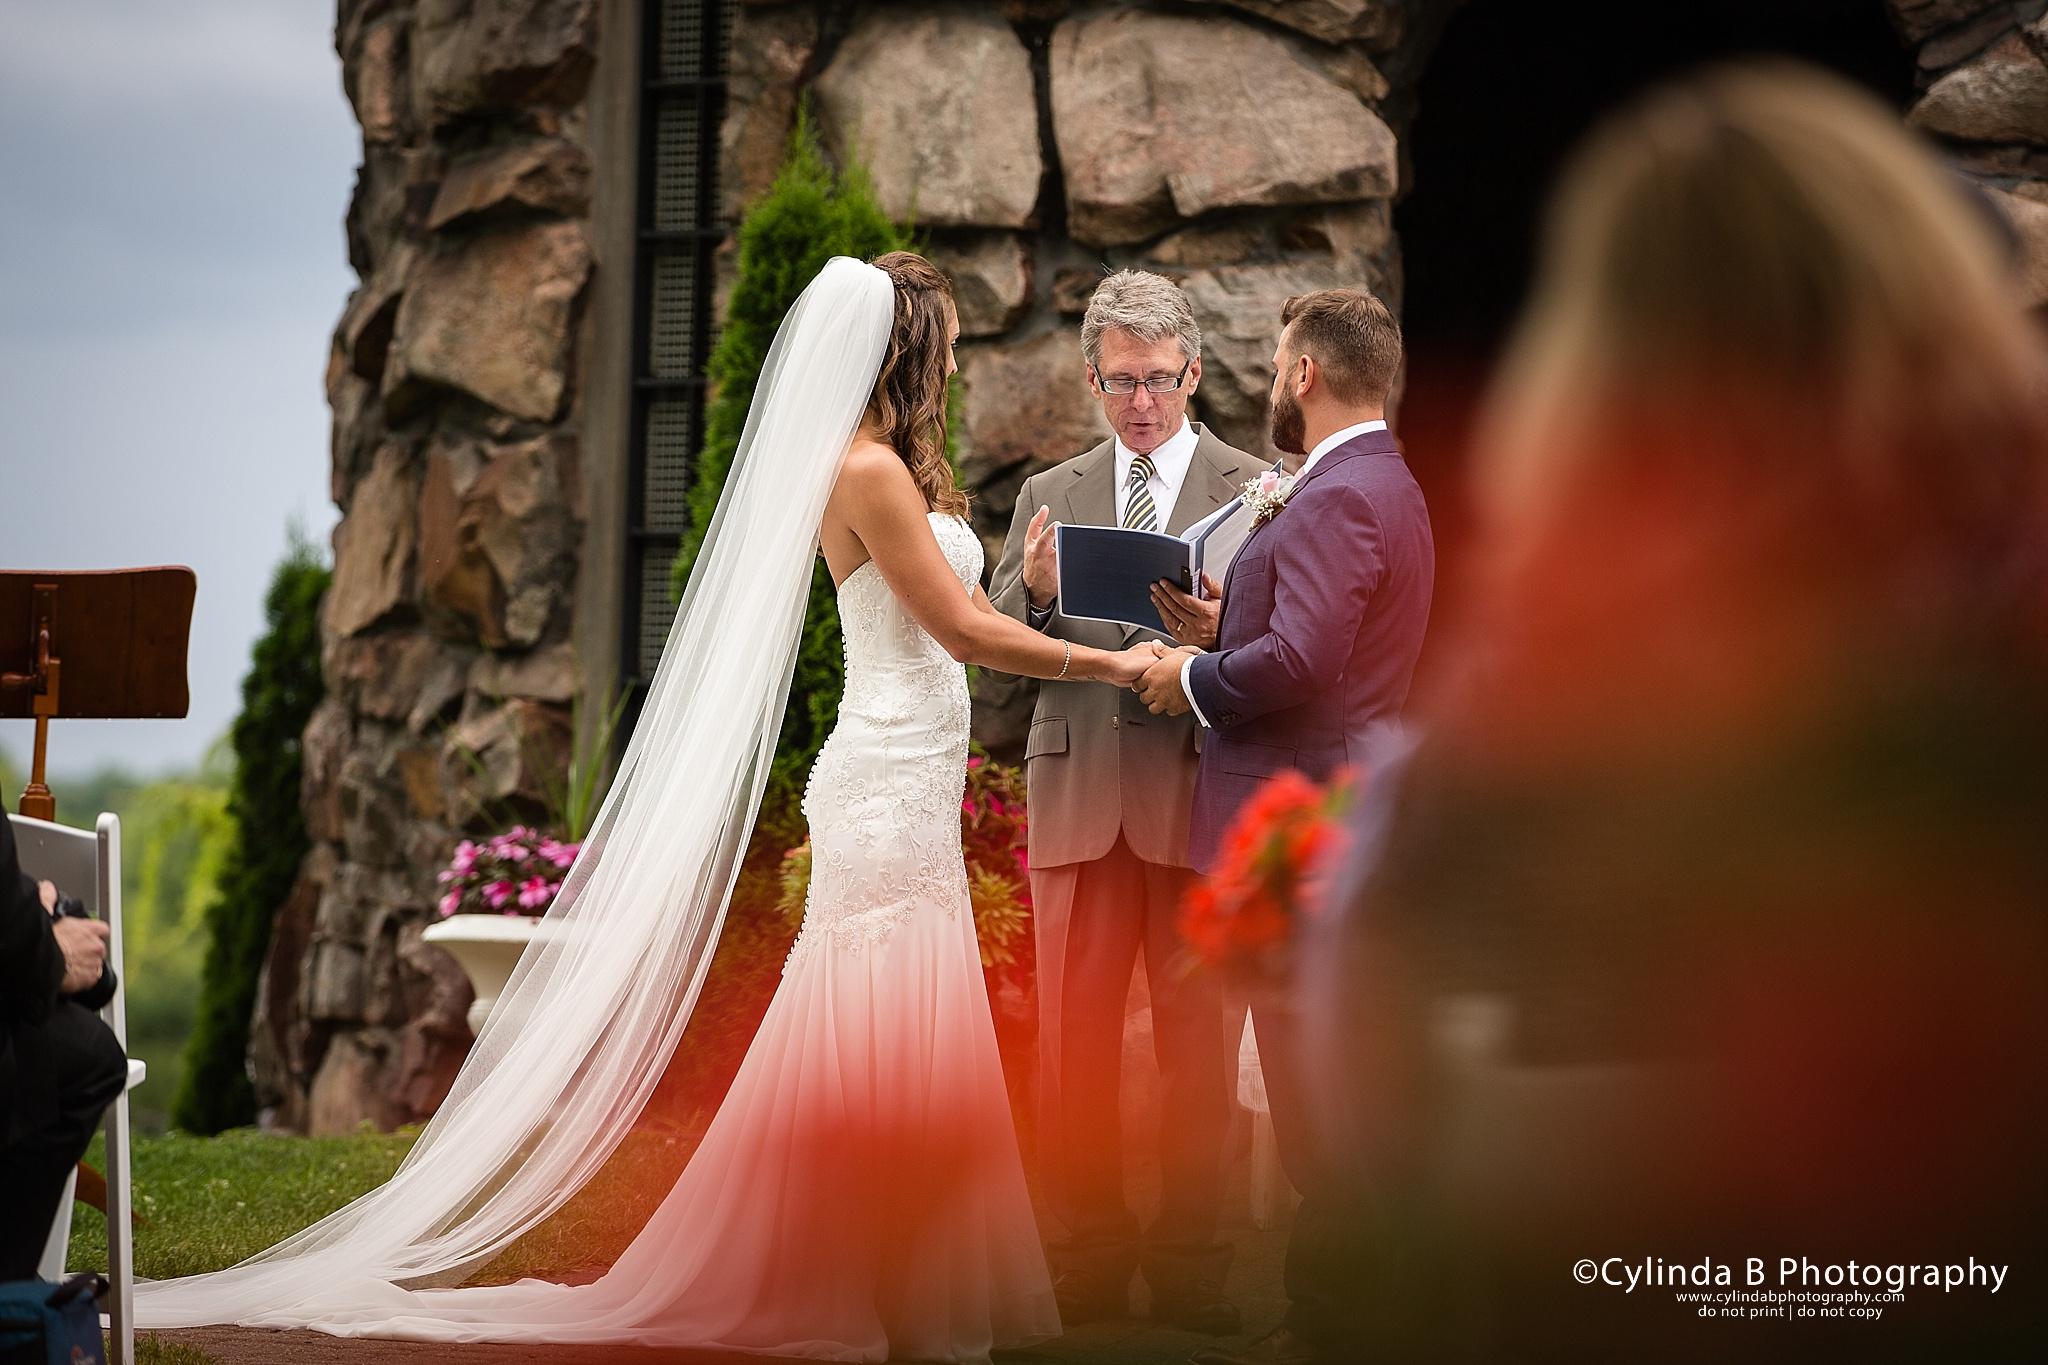 Boldt Castle Wedding, Alexandria Bay, Wedding, Photograper, Cylinda B Photography-22